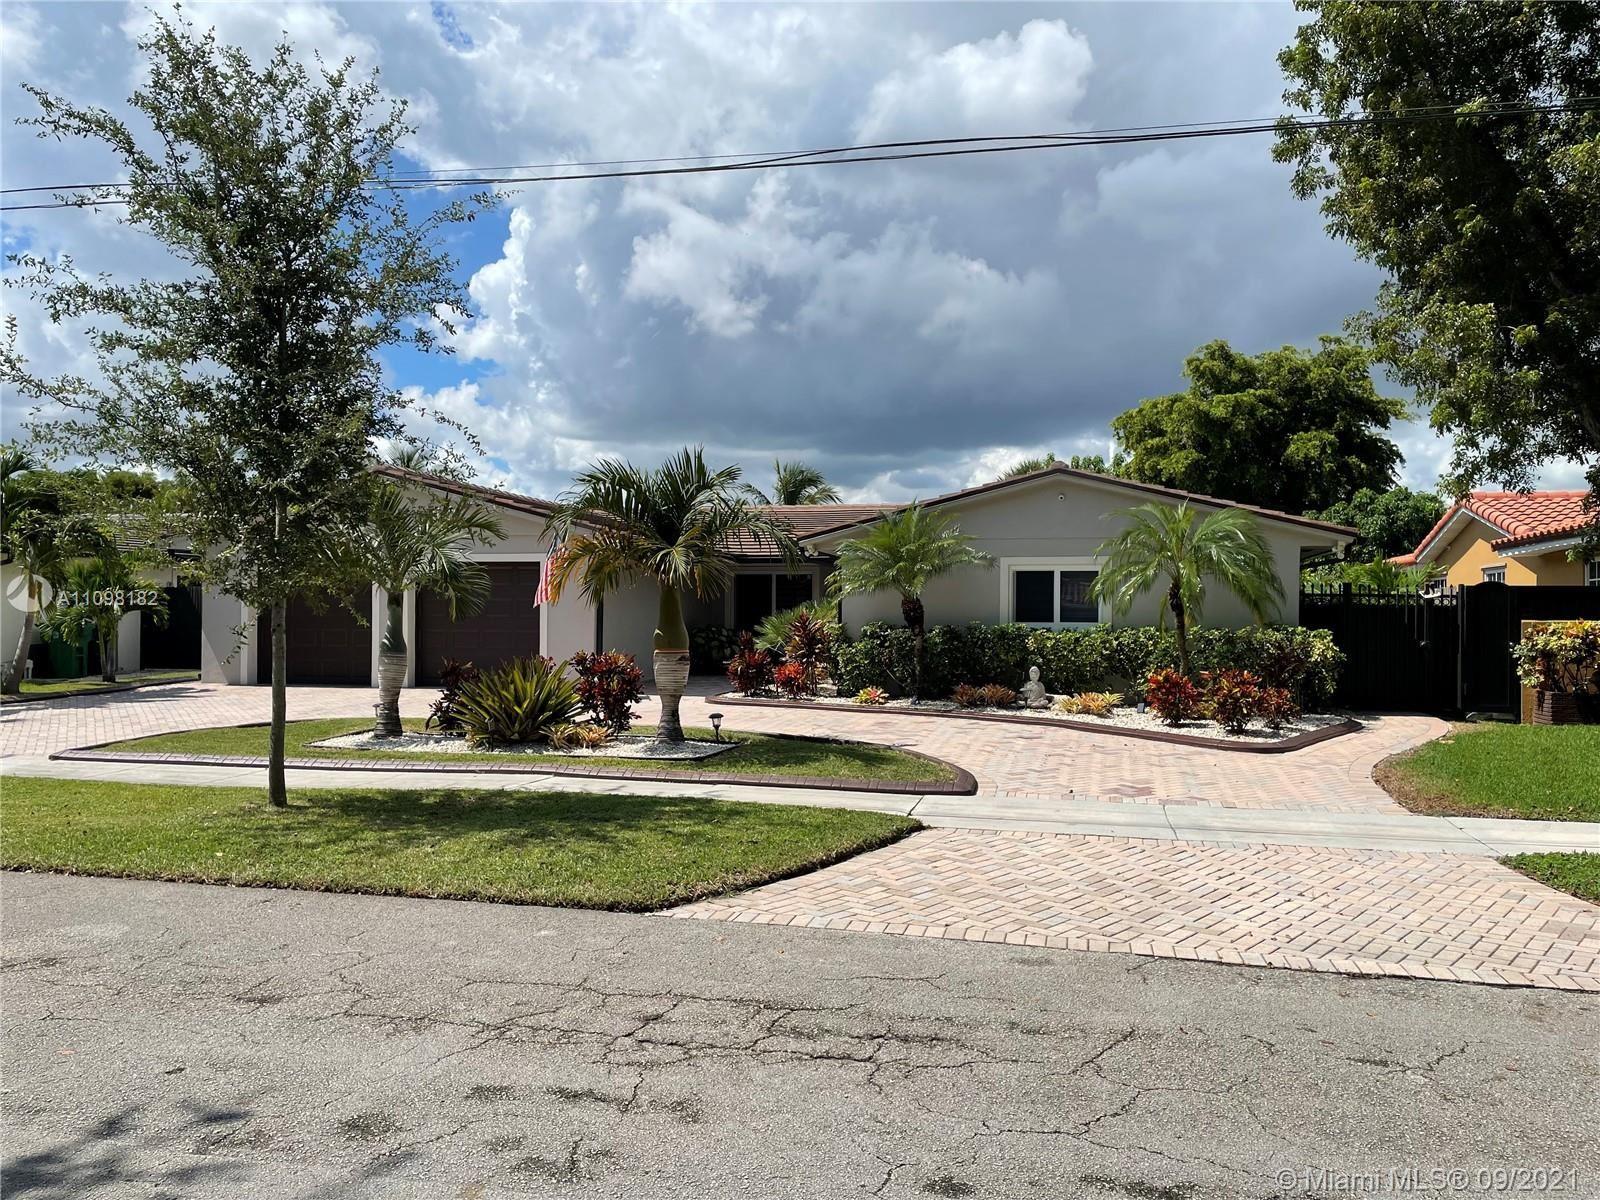 14500 Lake Crescent Pl, Miami Lakes, FL 33014 - #: A11098182